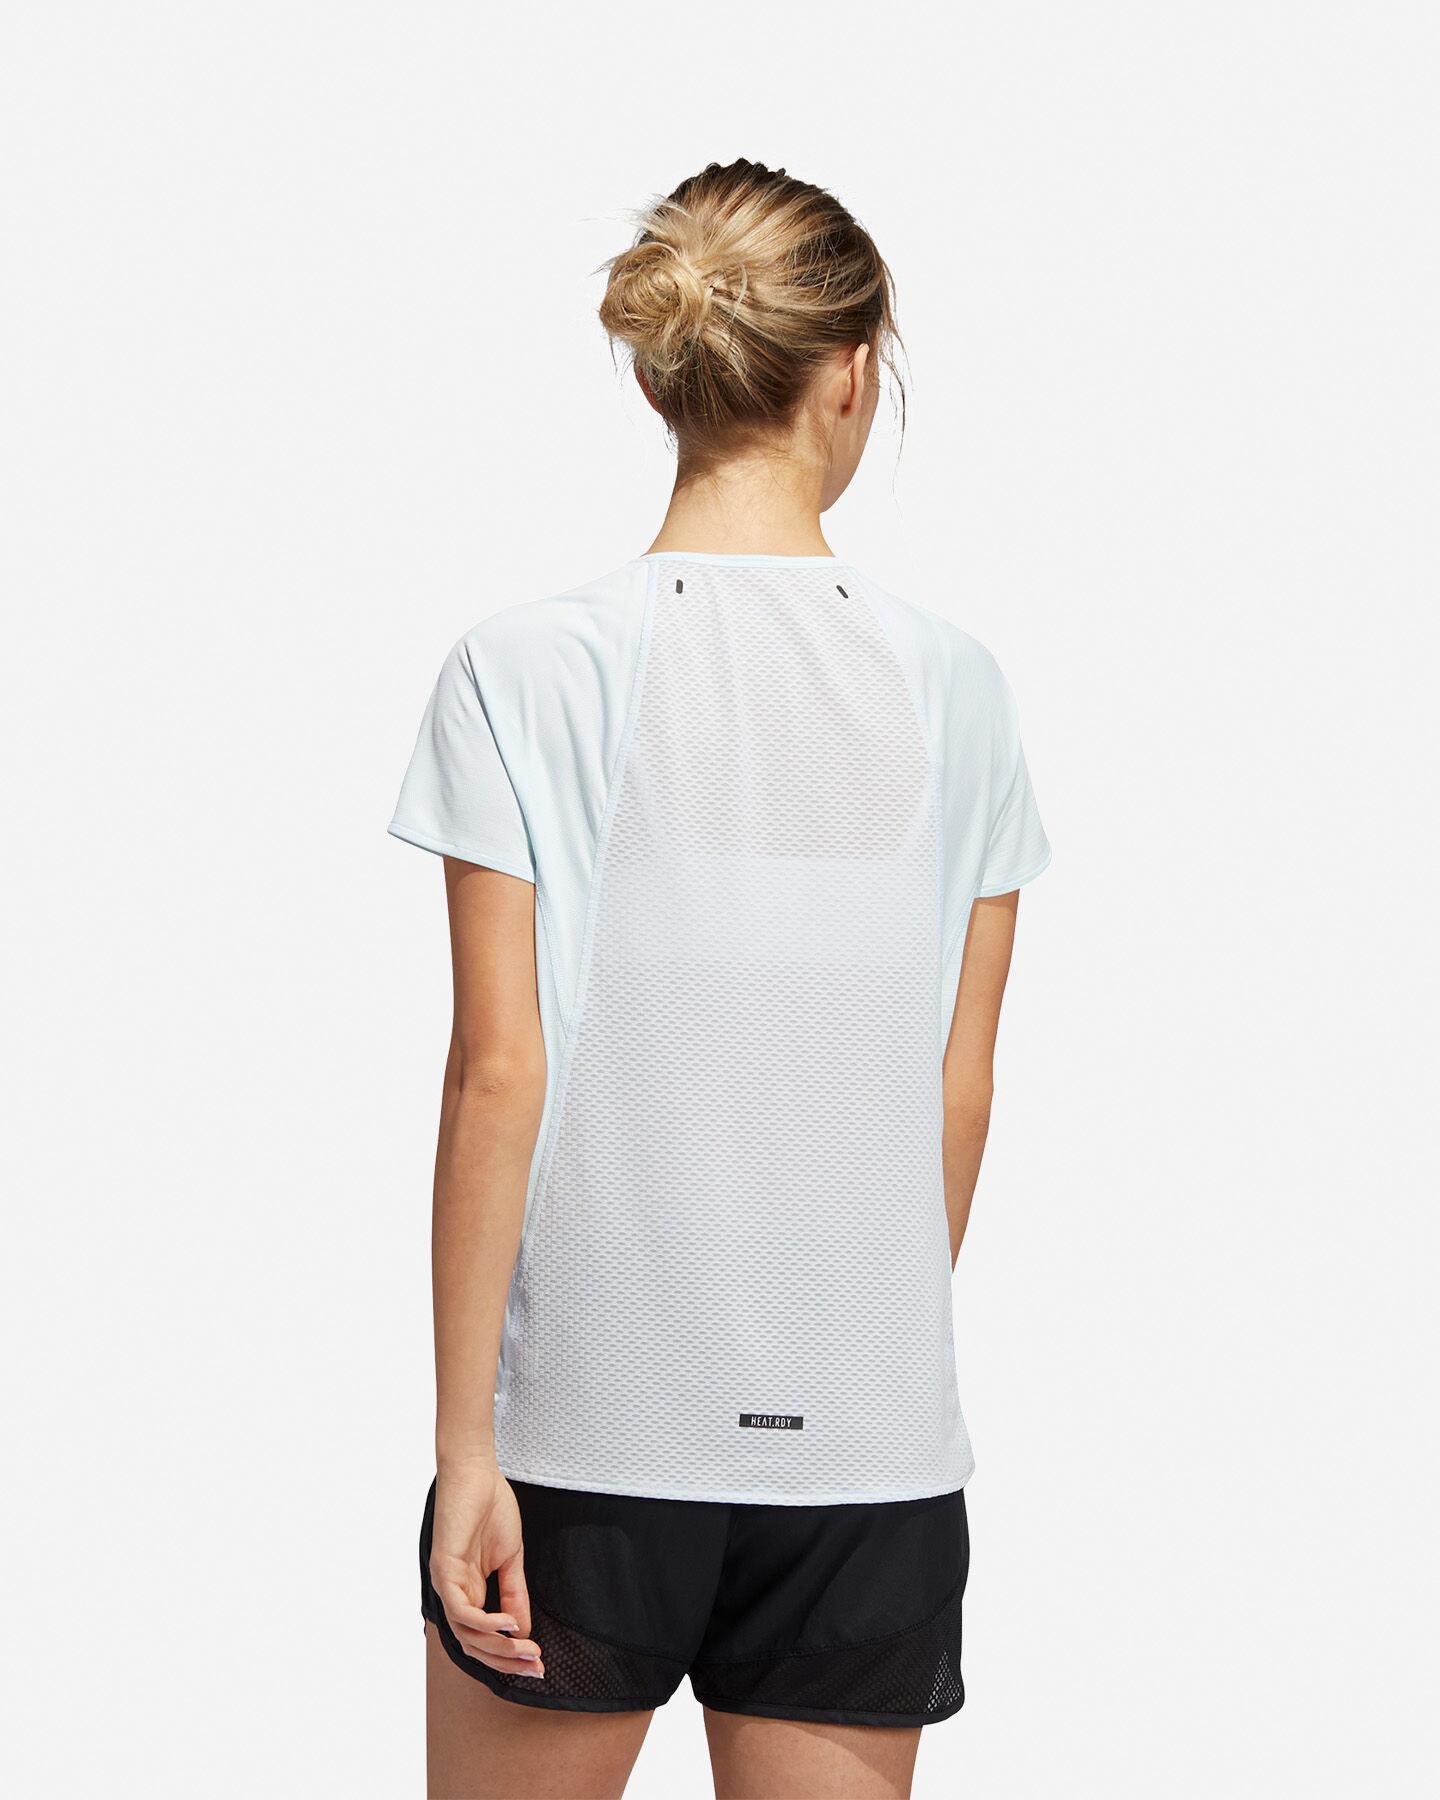 T-Shirt running ADIDAS HEAT.RDY W S5154889 scatto 4